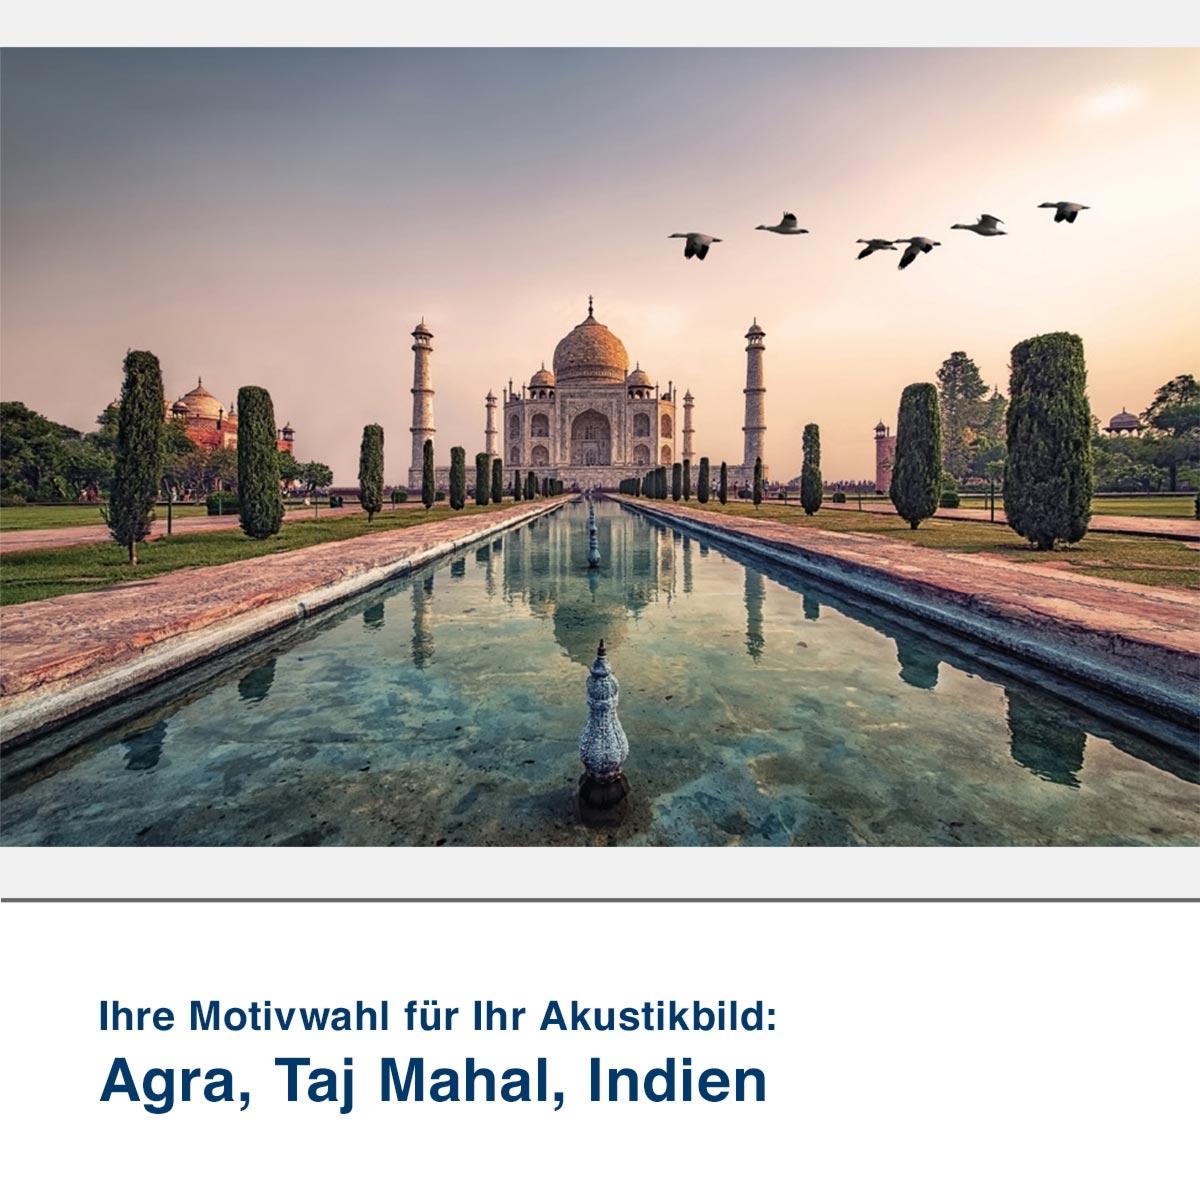 Akustikbild Motiv Agra, Taj Mahal, Indien